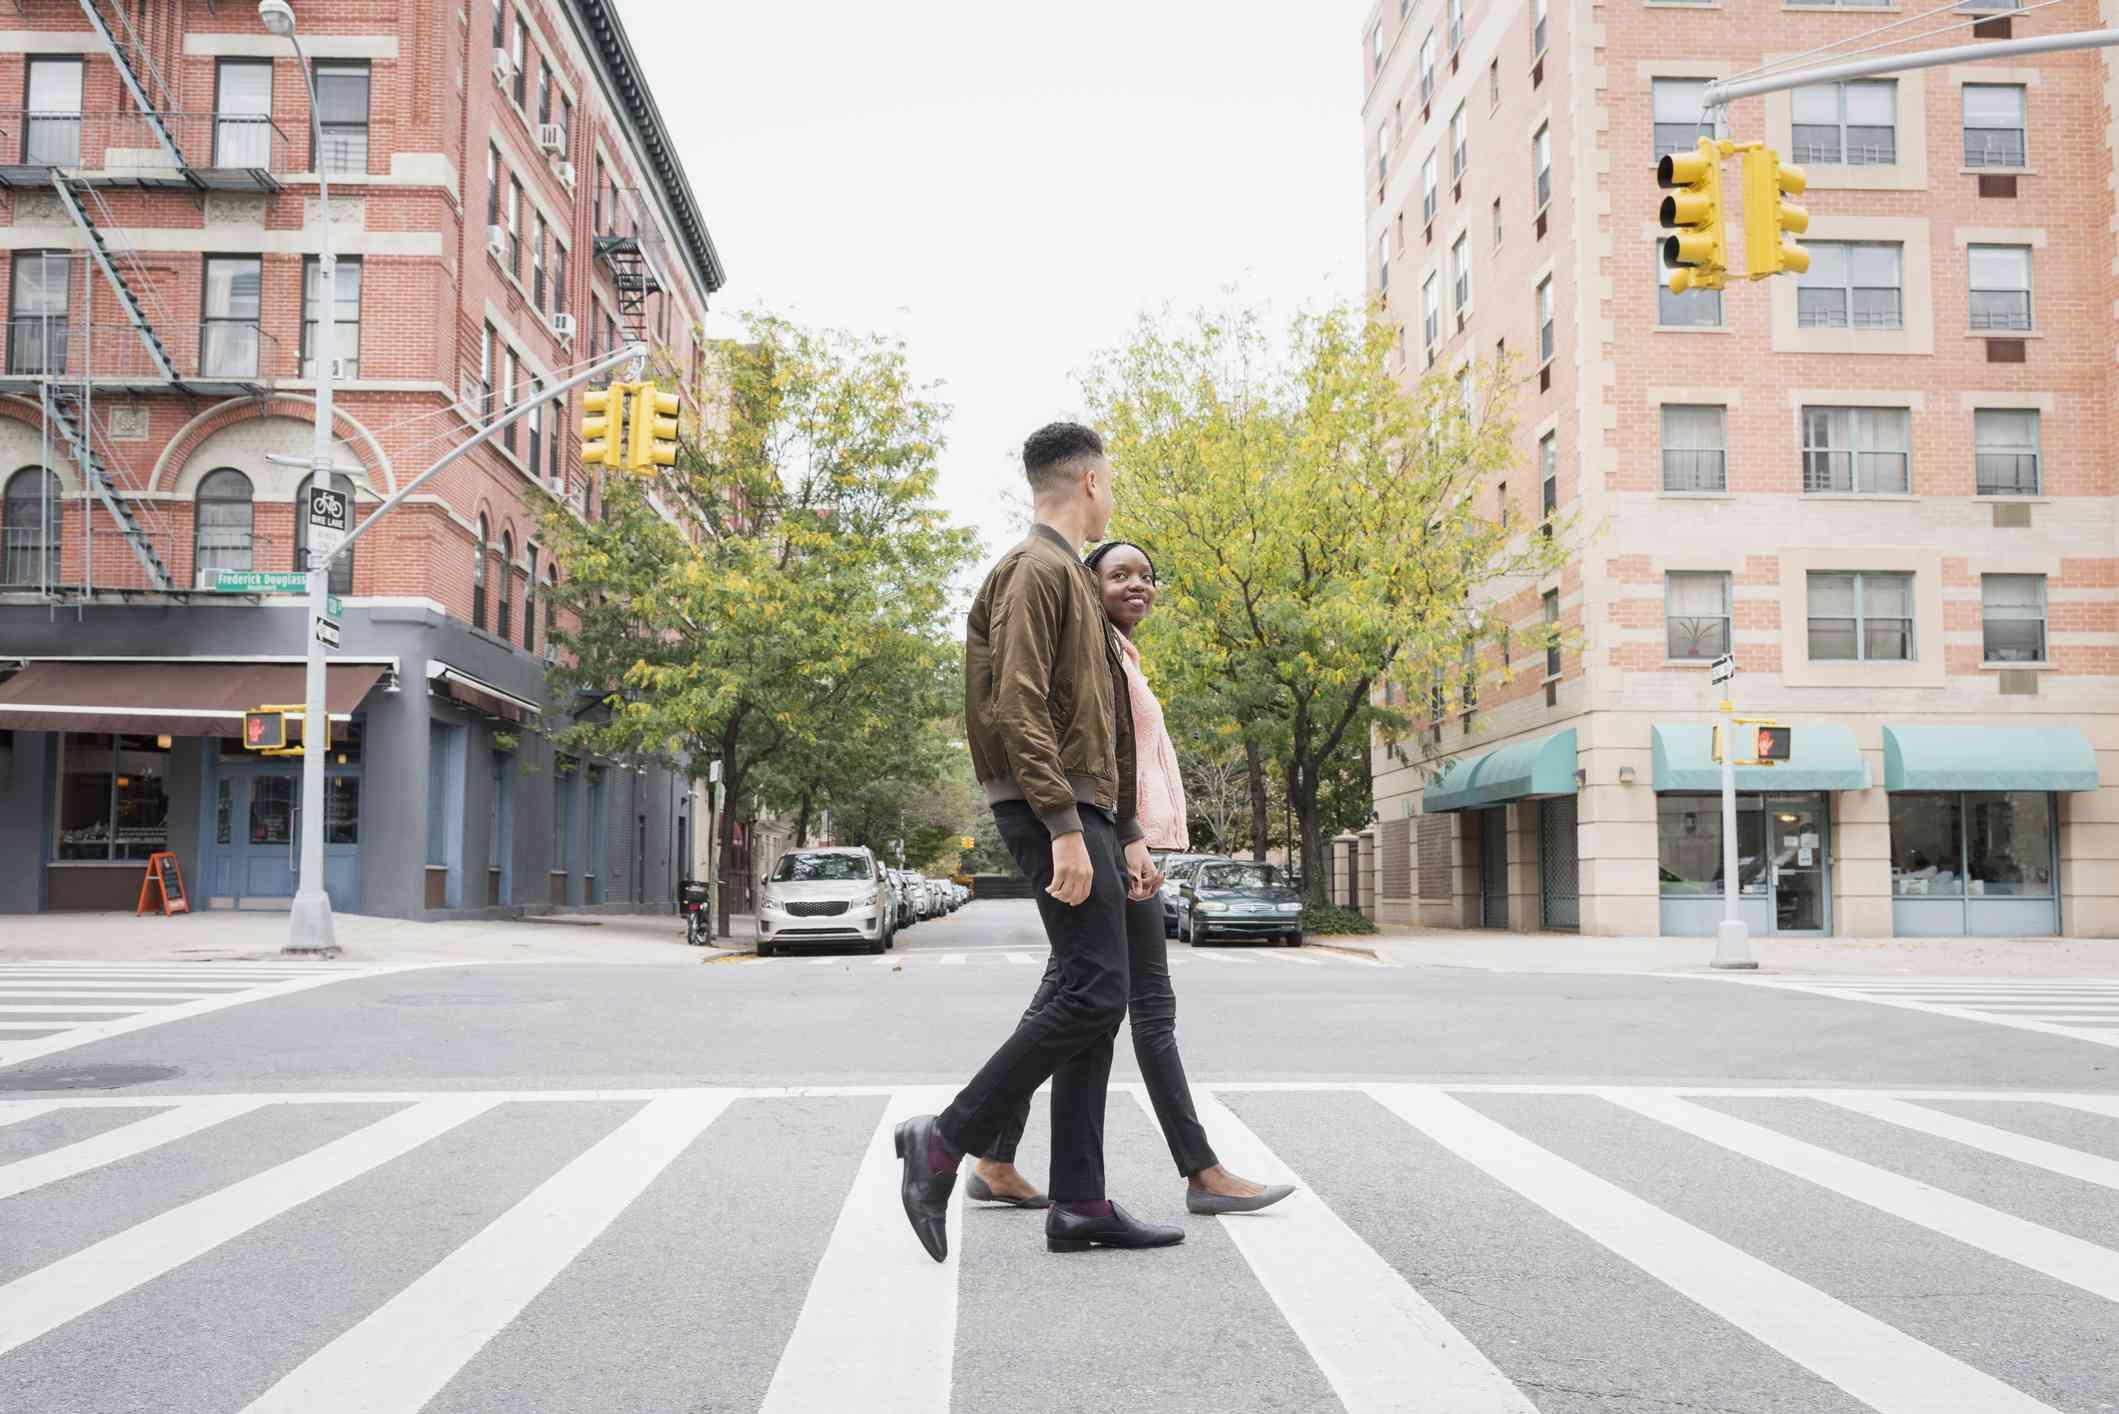 Young couple walks around city